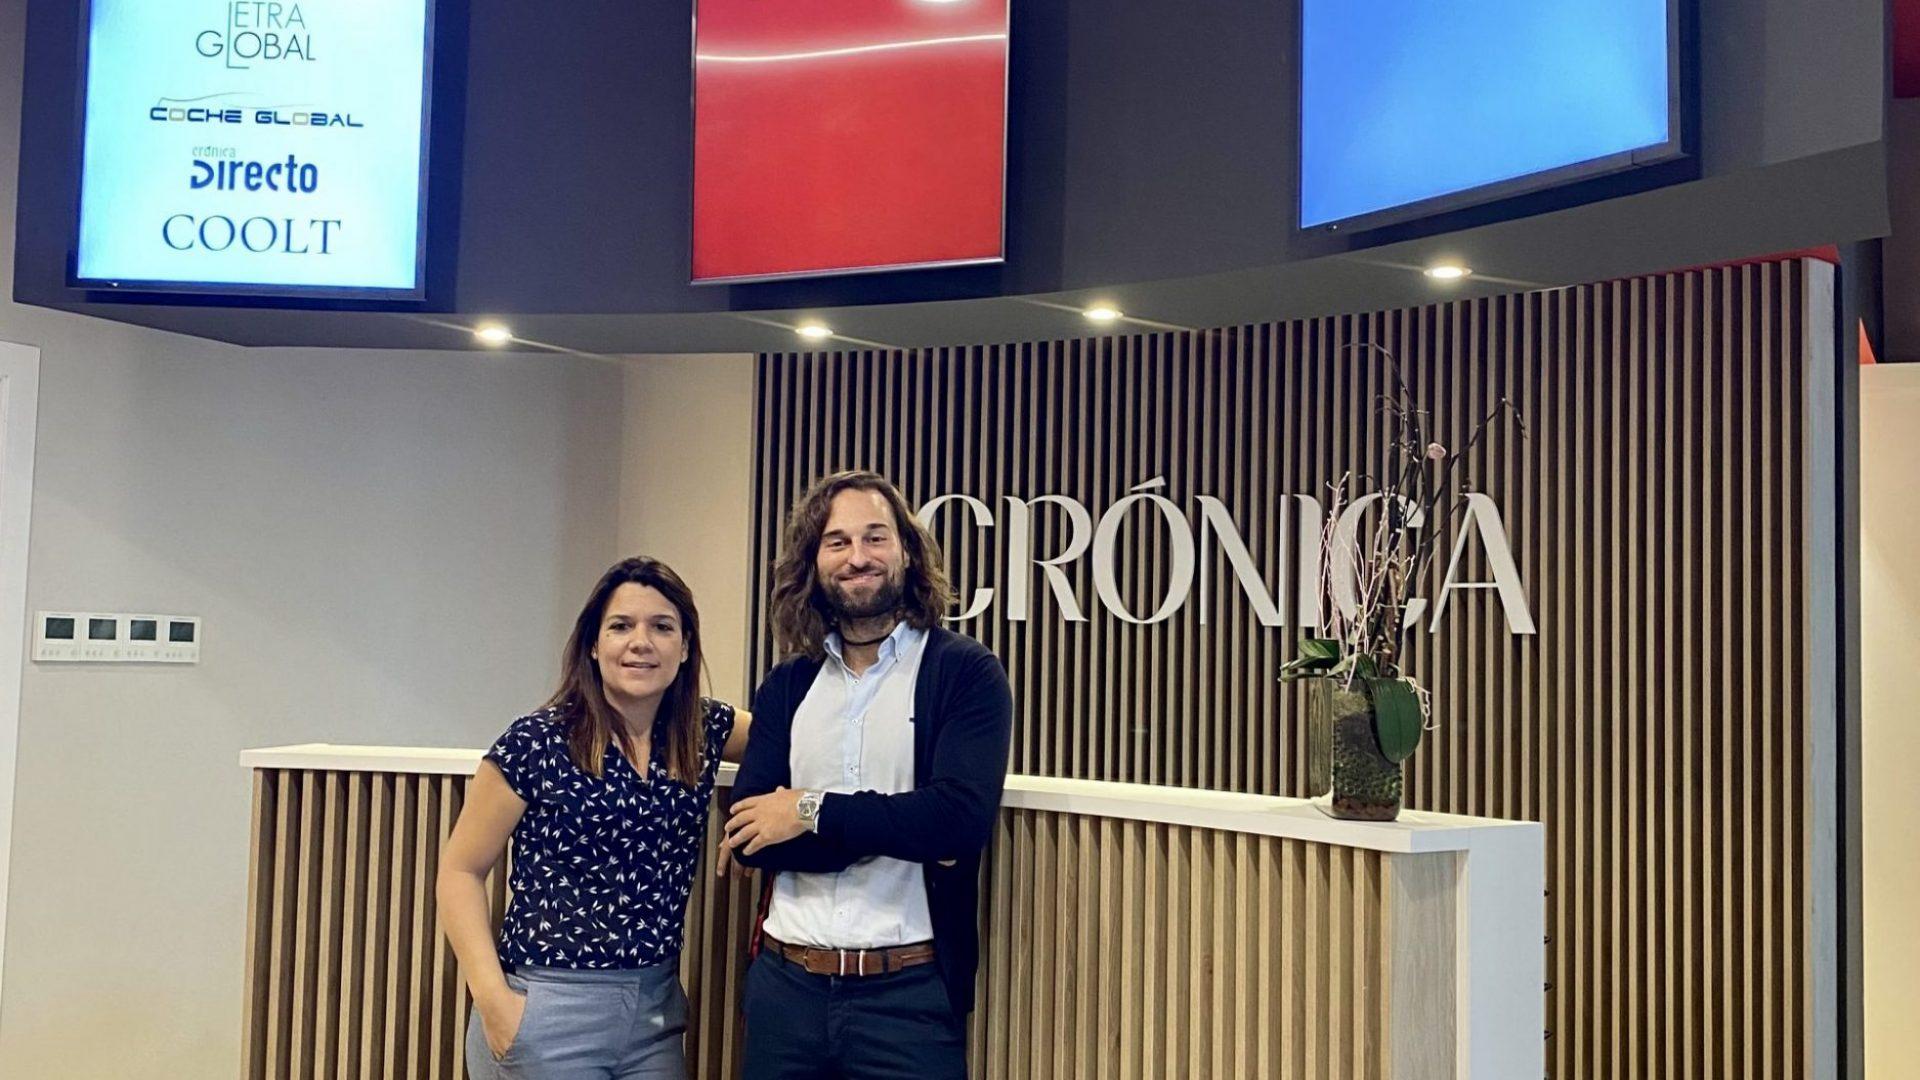 cronica_global_noticia1